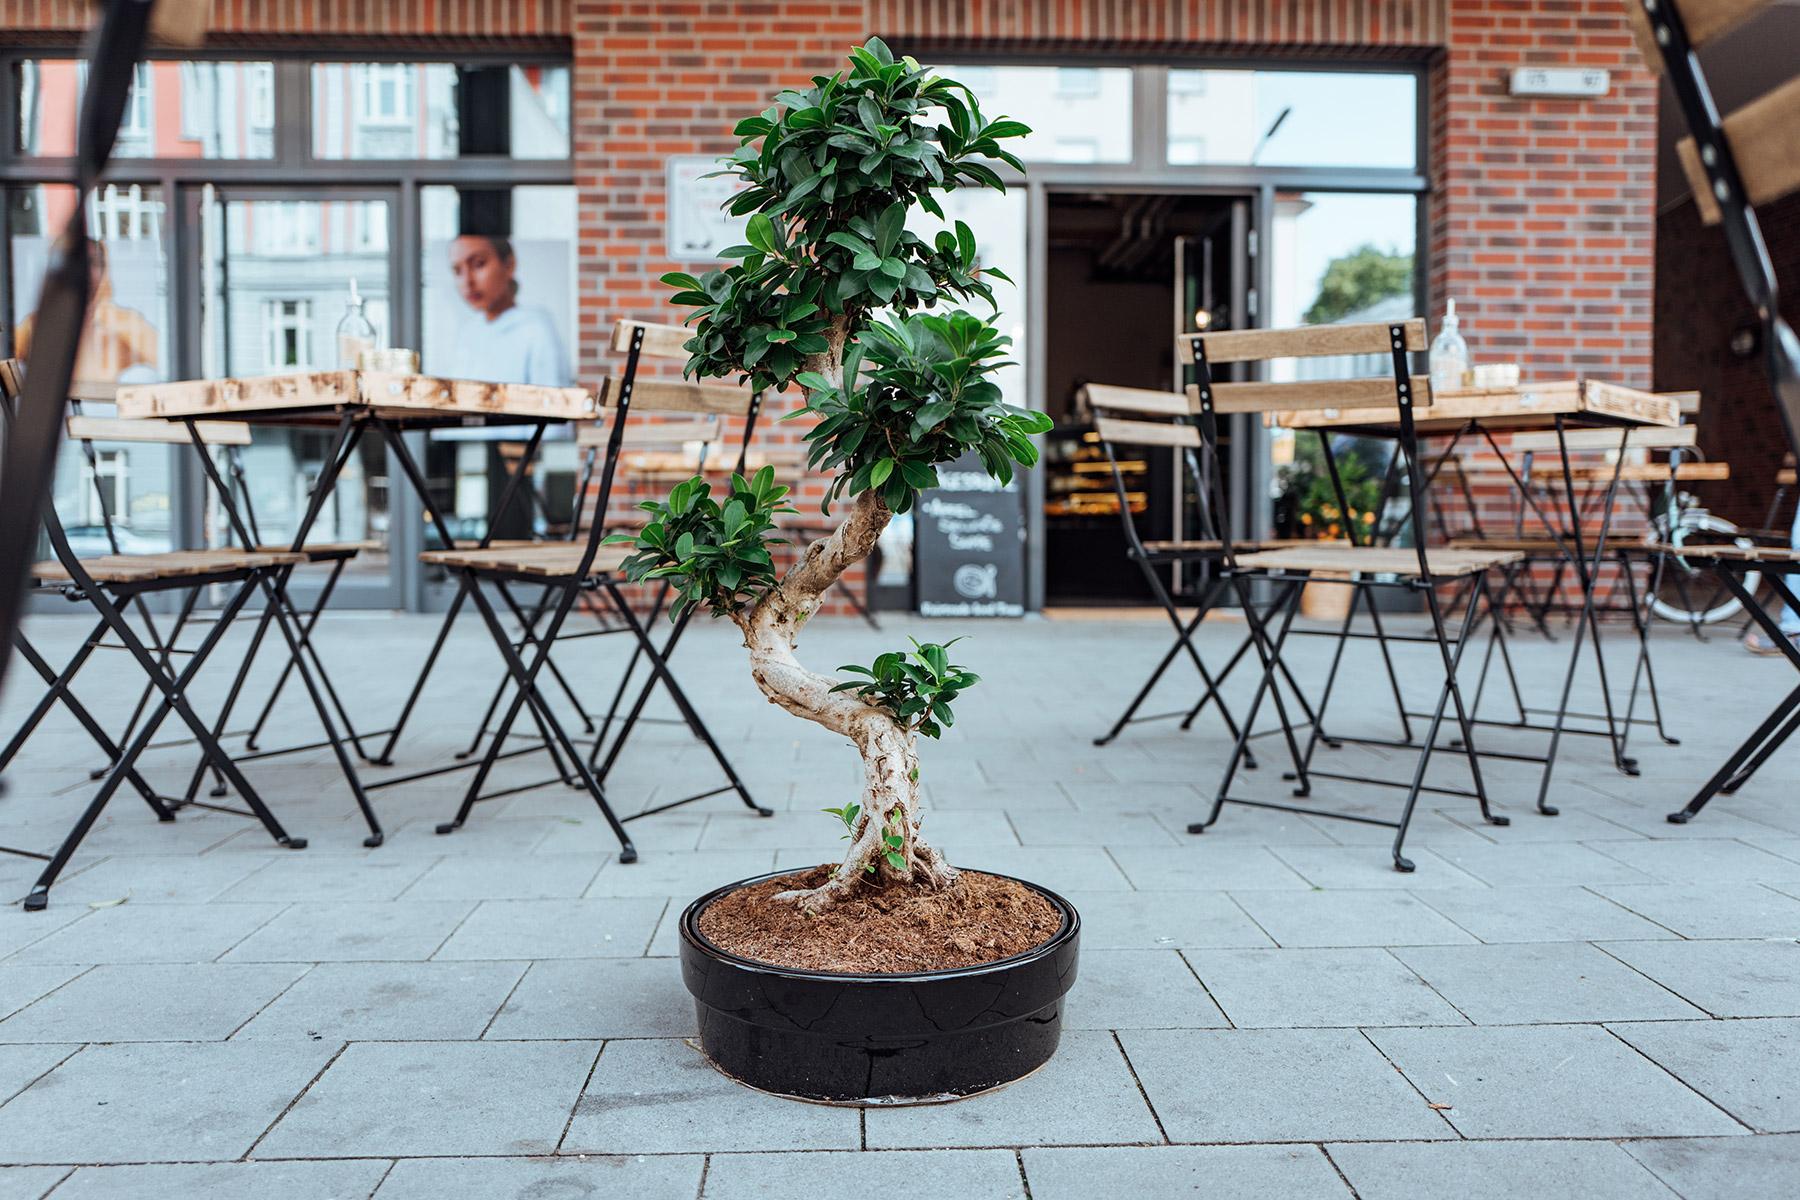 Geheimtipp Hamburg Altona Café NOLOSO Lisa Knauer 3